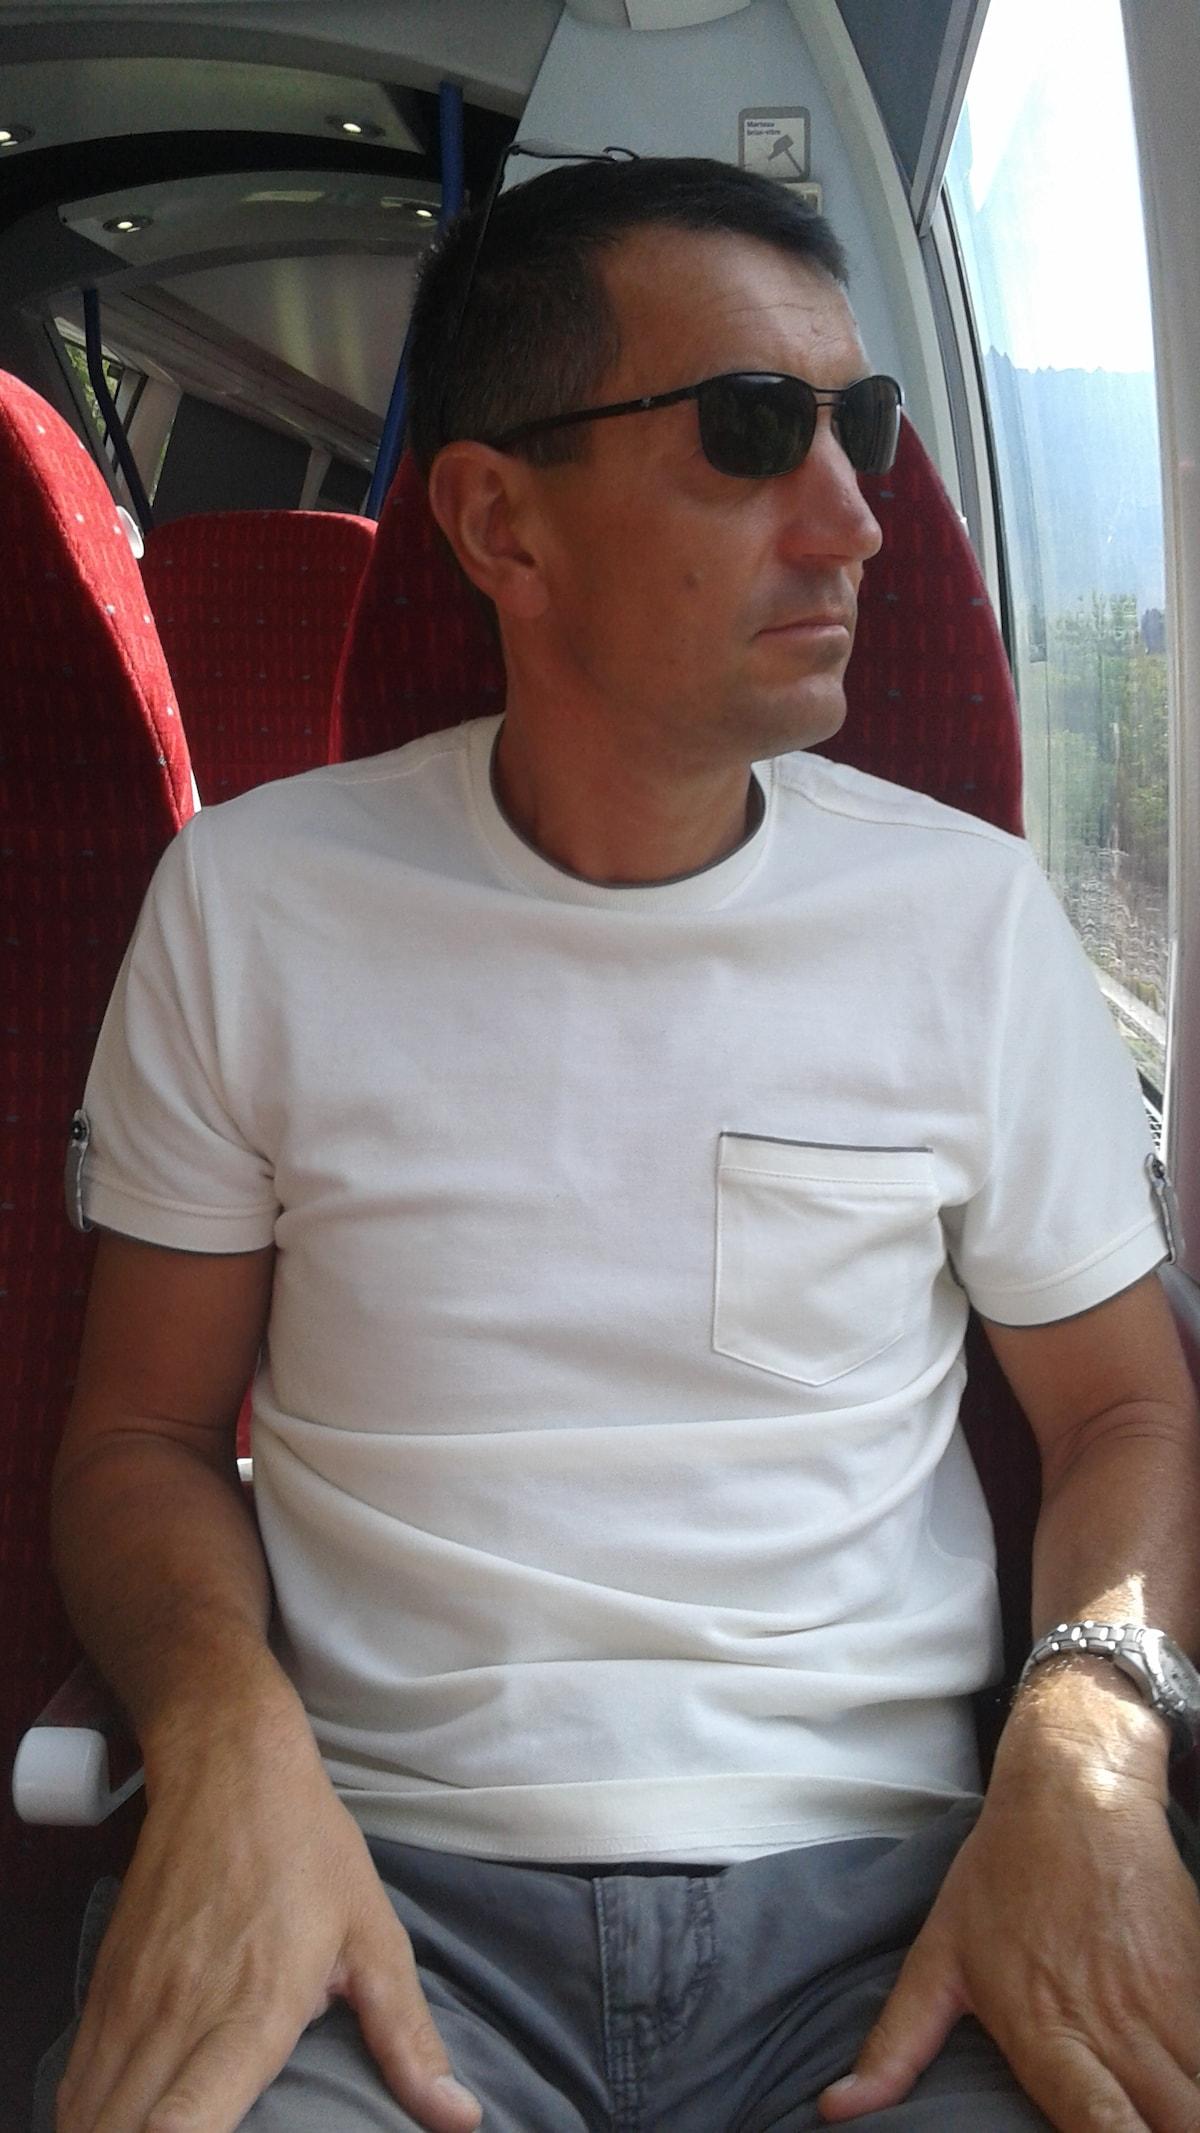 Philippe from Avignon